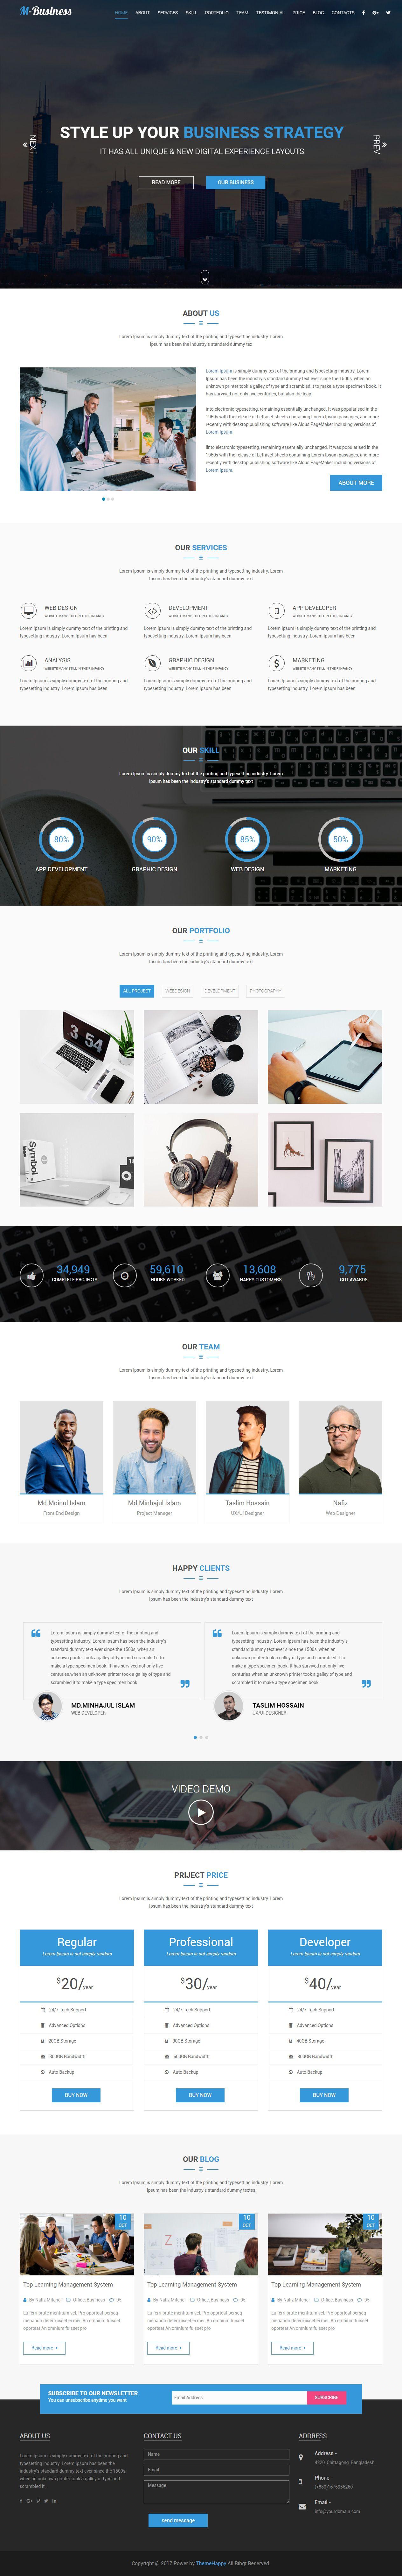 M-Business is Premium full Responsive Retina Parallax HTML5 Template ...